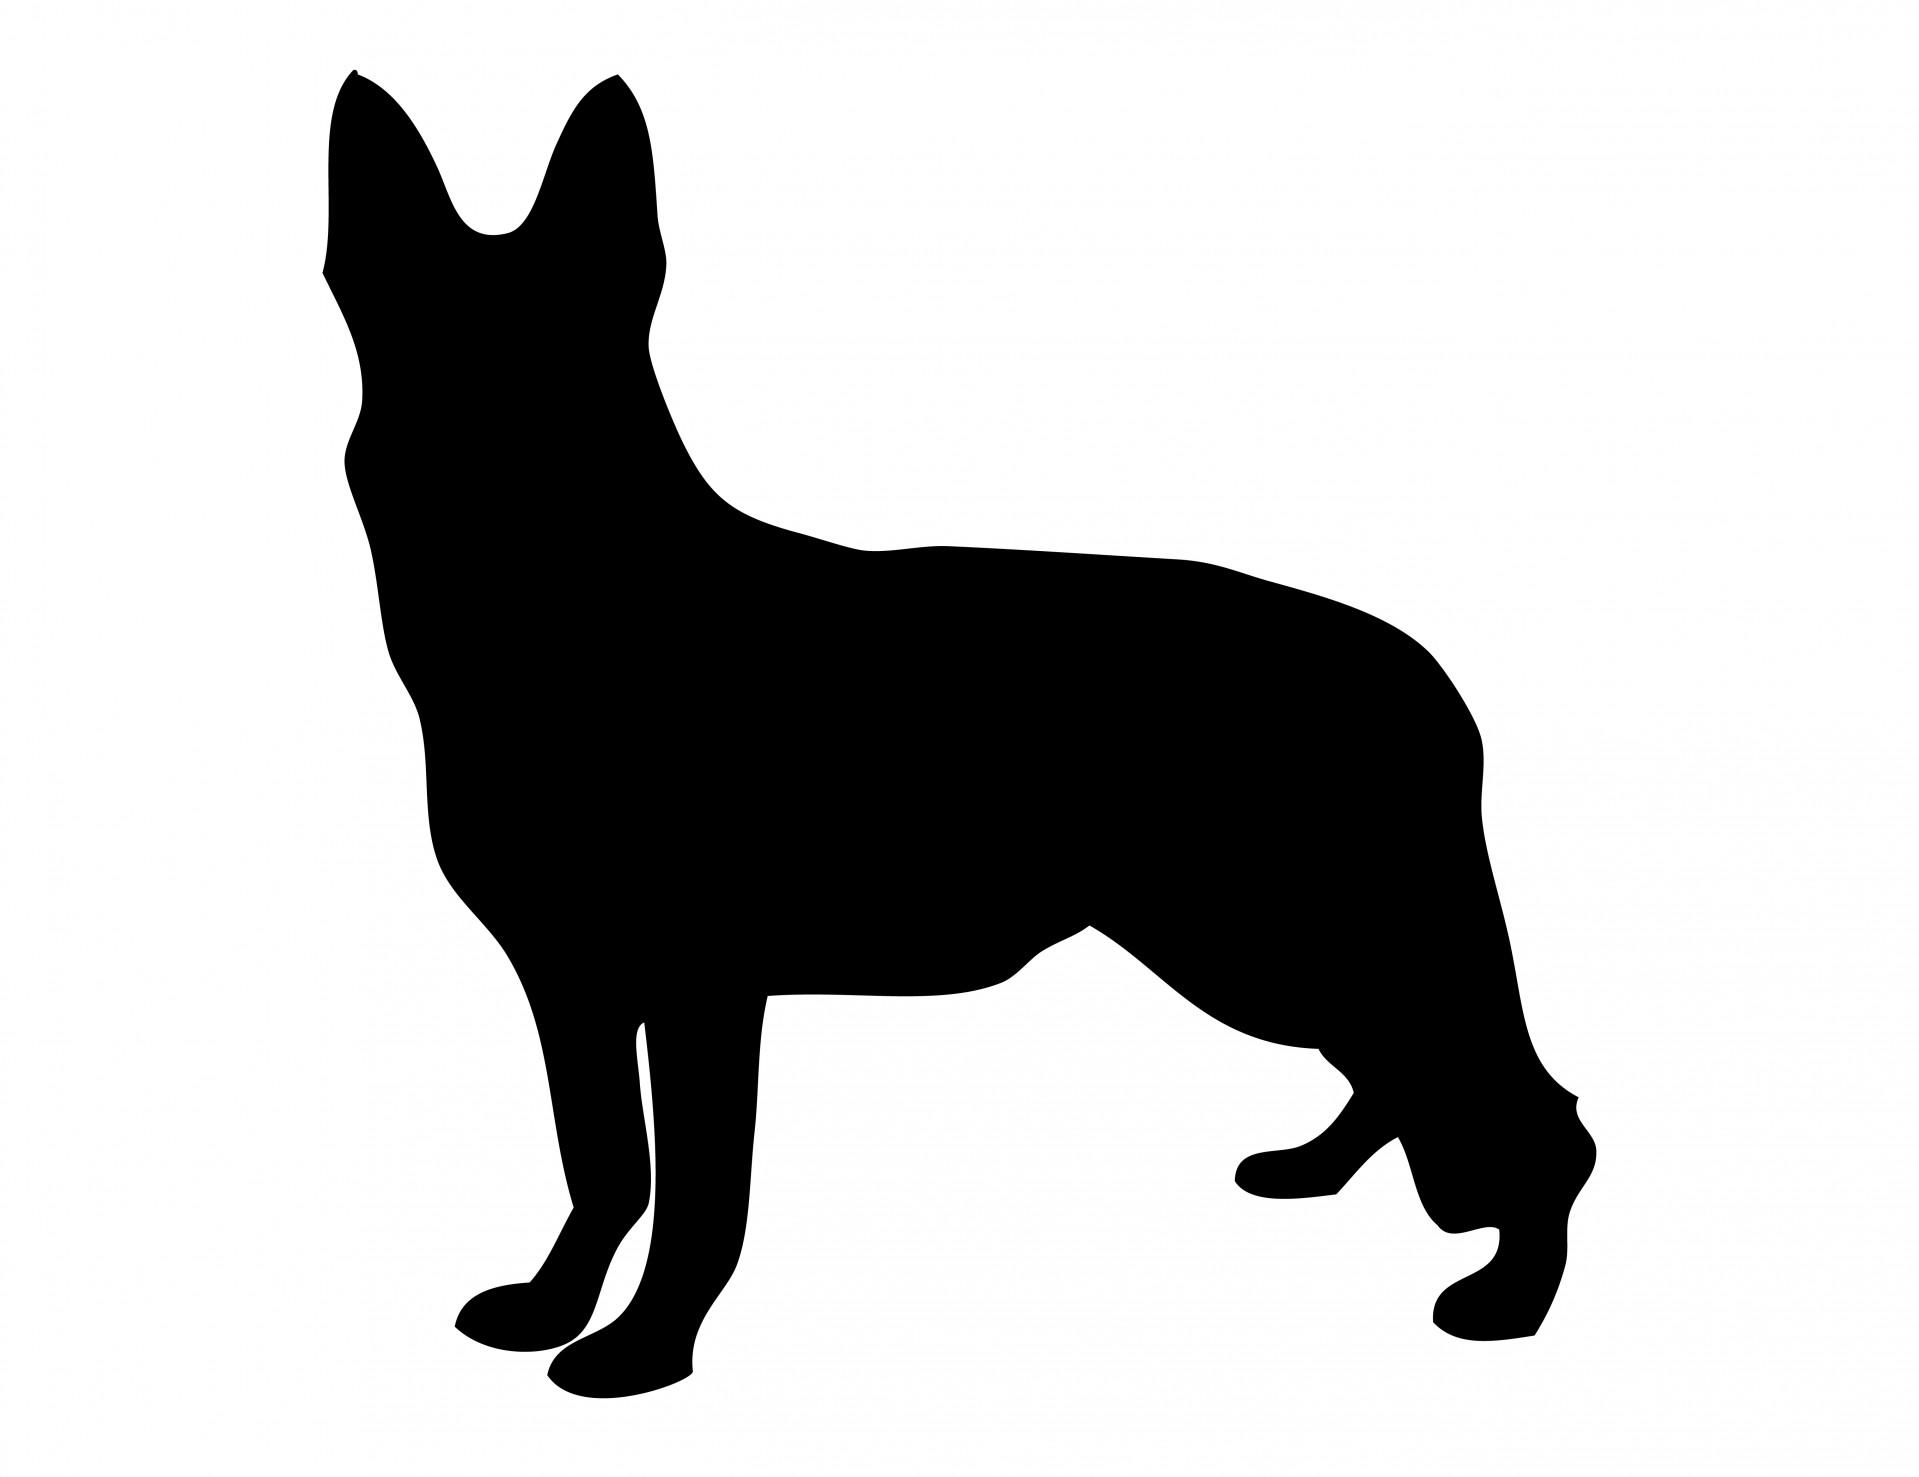 Dog German Shepherd Silhouette Free Stock Photo.